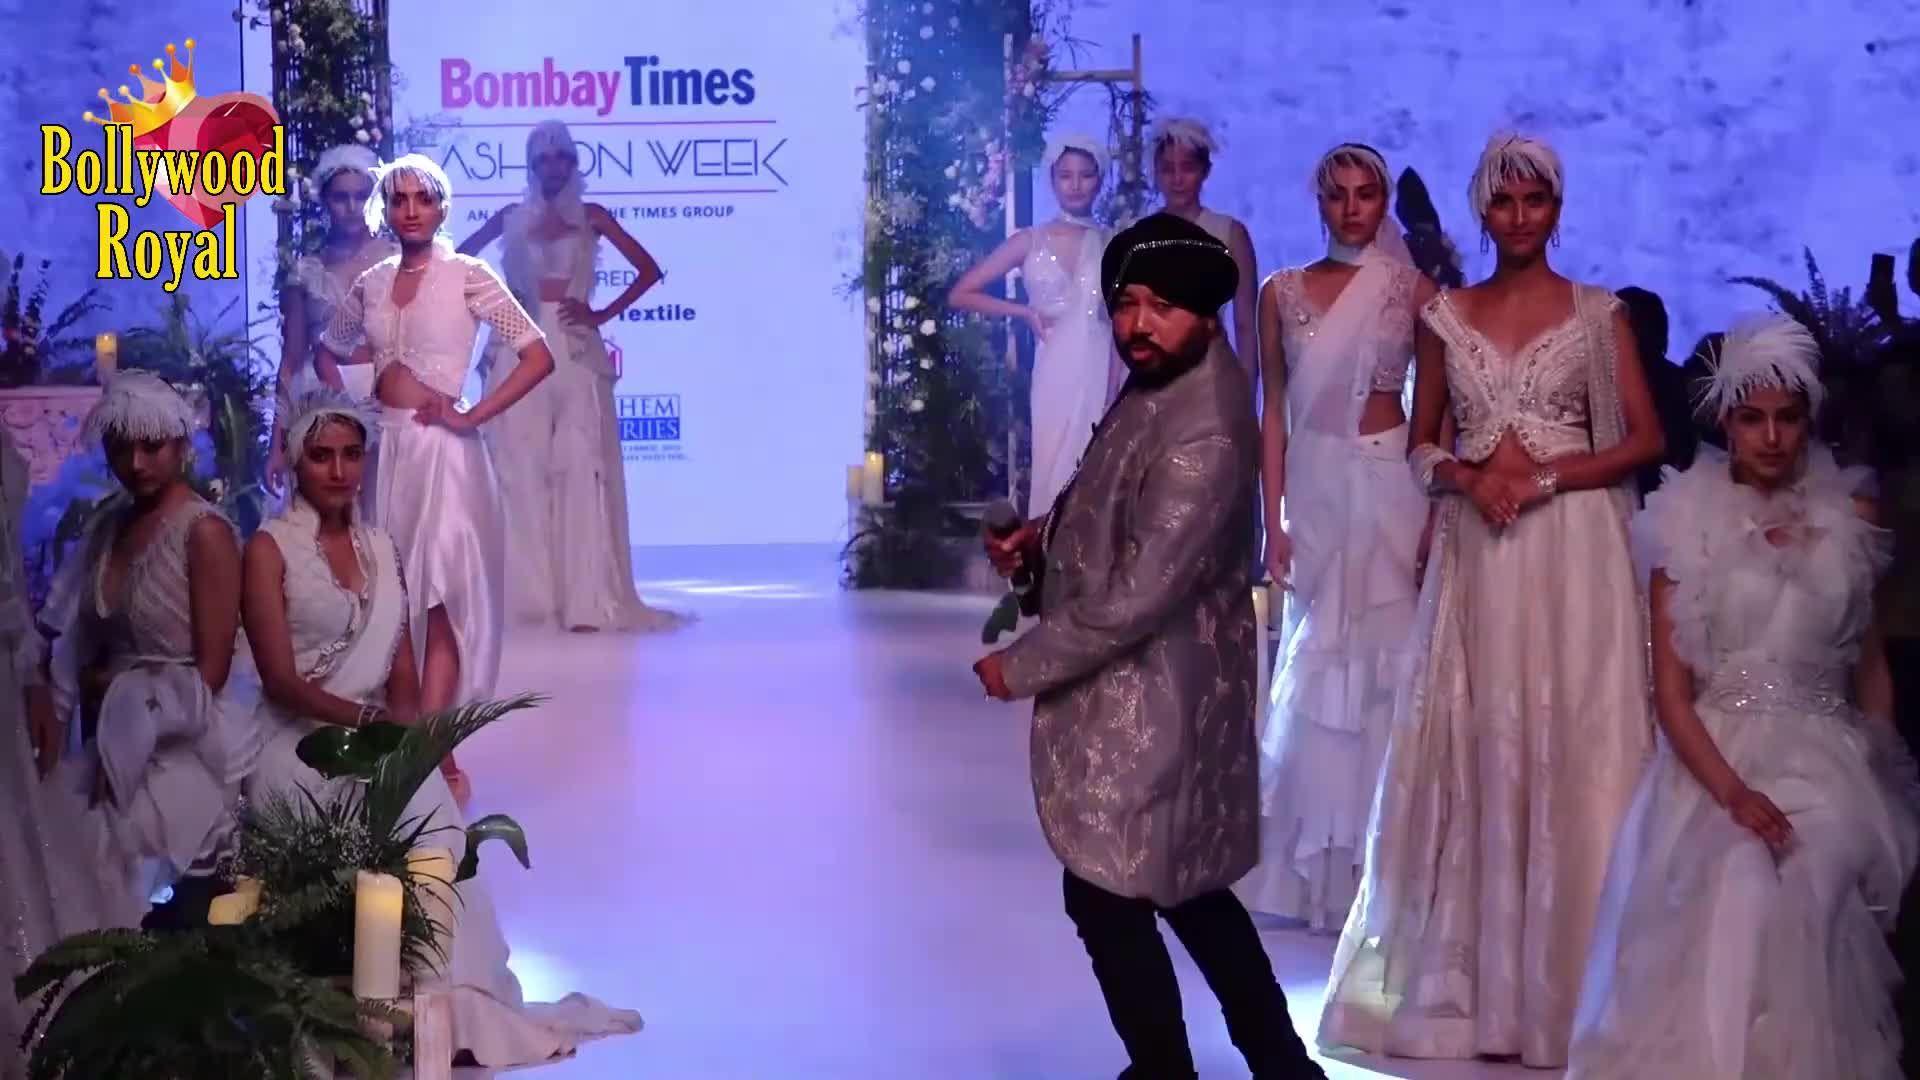 Tara Sutaria Walks For Sulakshana Monga At Bombay Times Fashion Week 2020